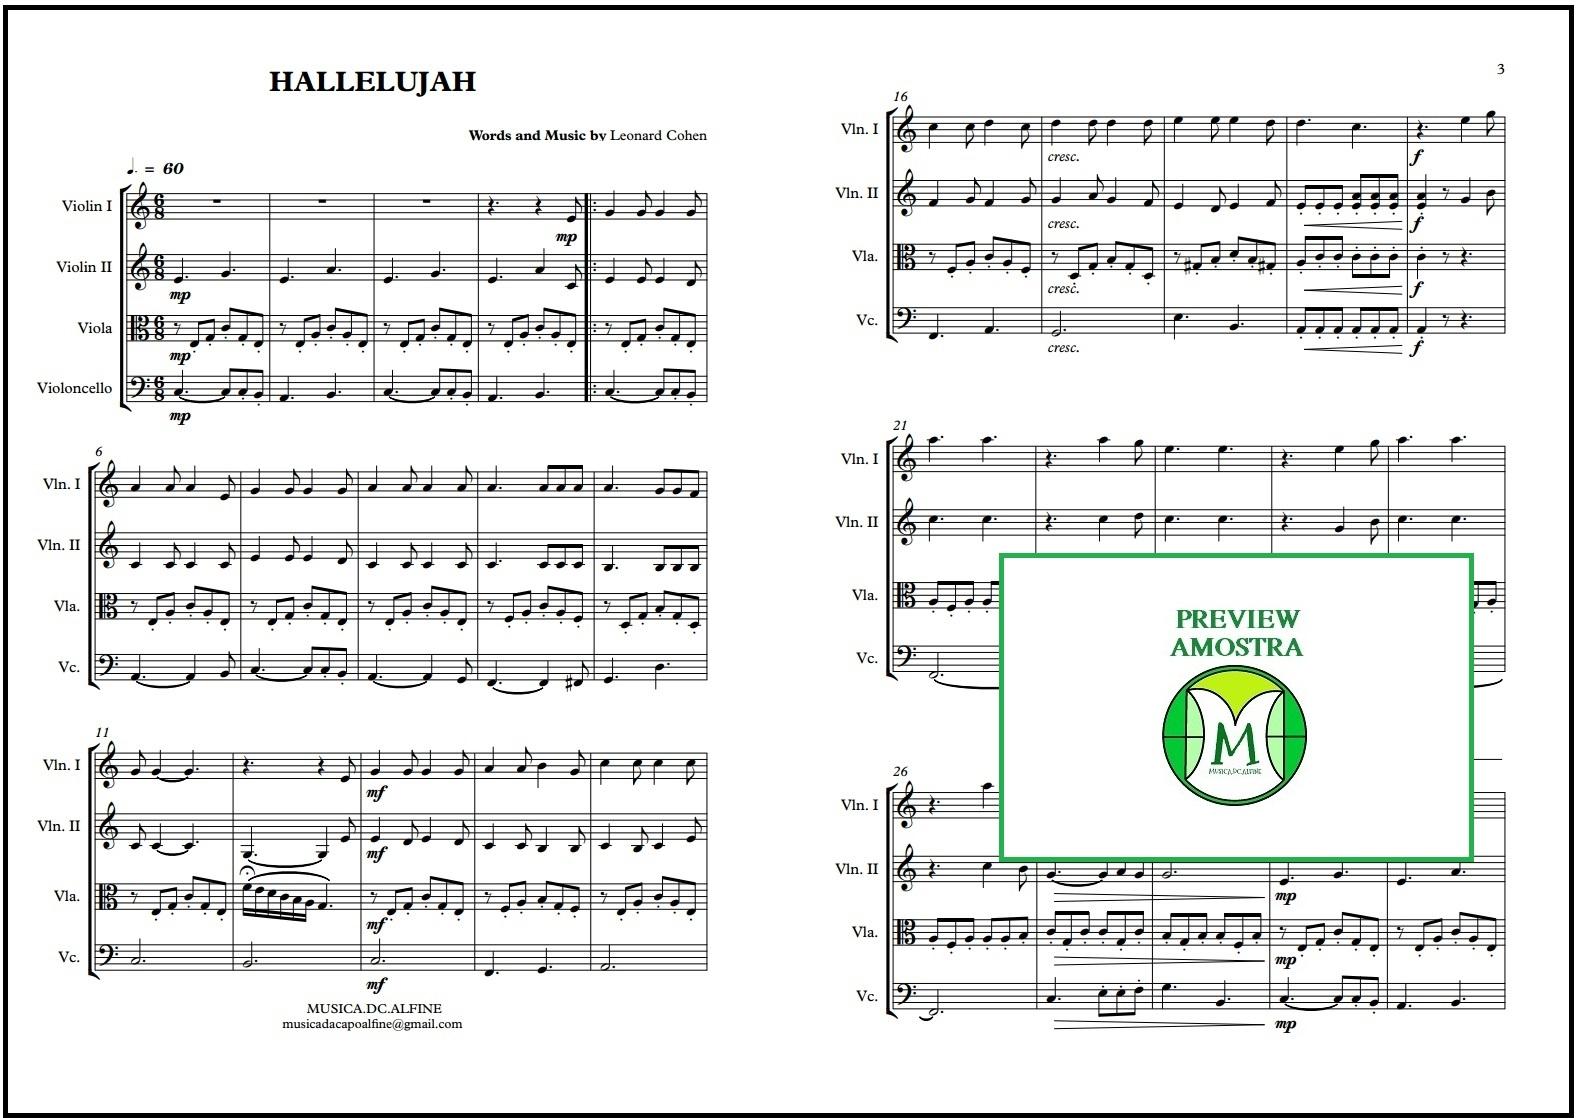 SHREK BAIXAR HALLELUJAH